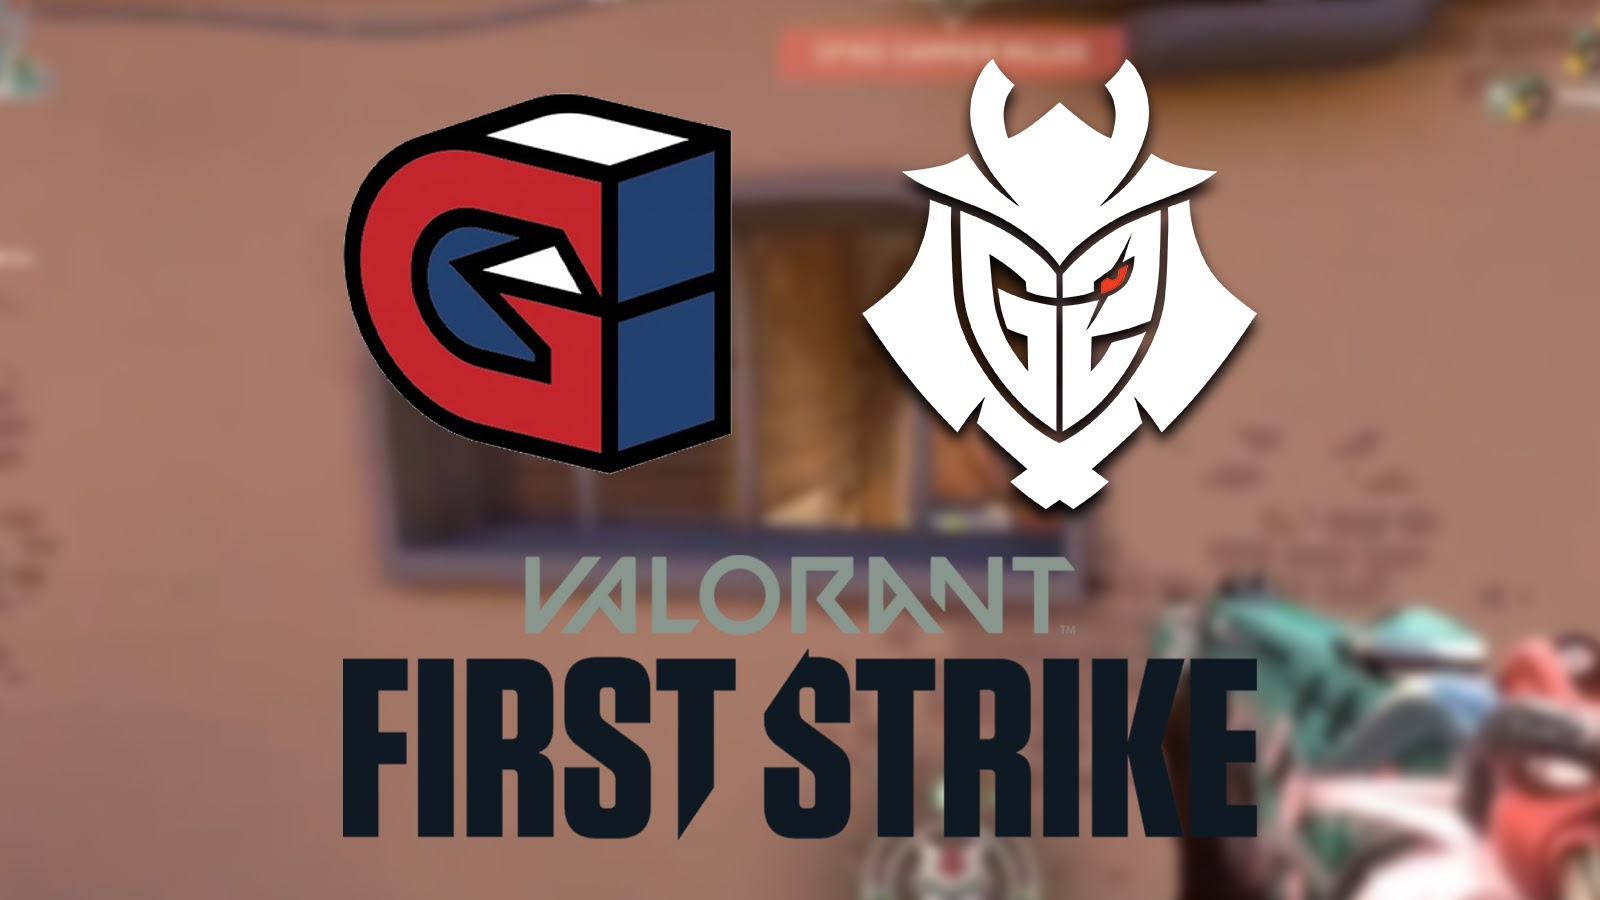 Valorant team logos